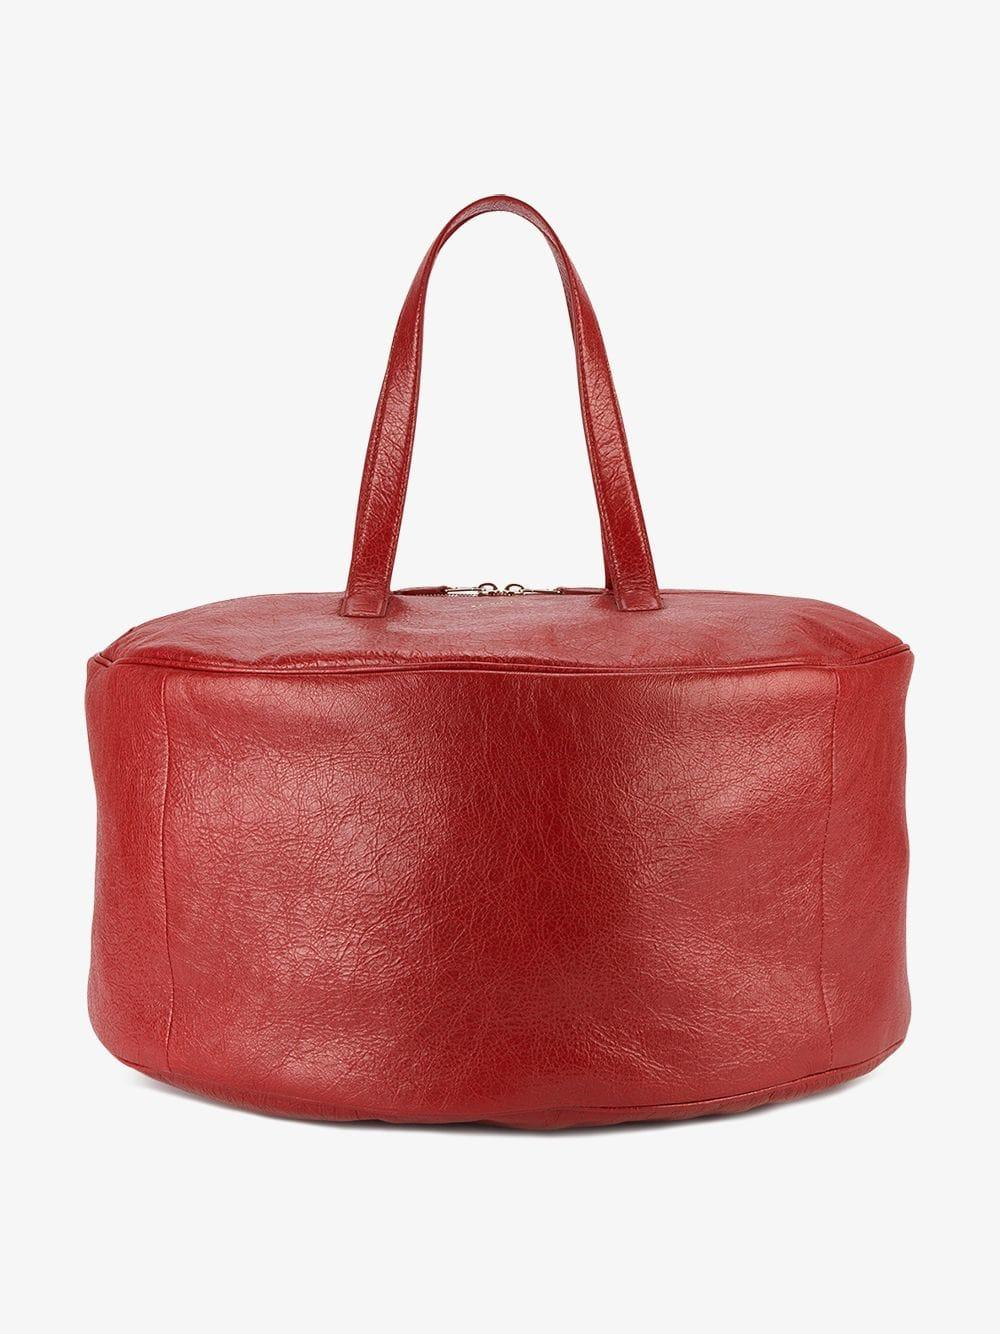 1543825e2603 Balenciaga - Large Red Air Hobo Tote Bag - Lyst. View fullscreen